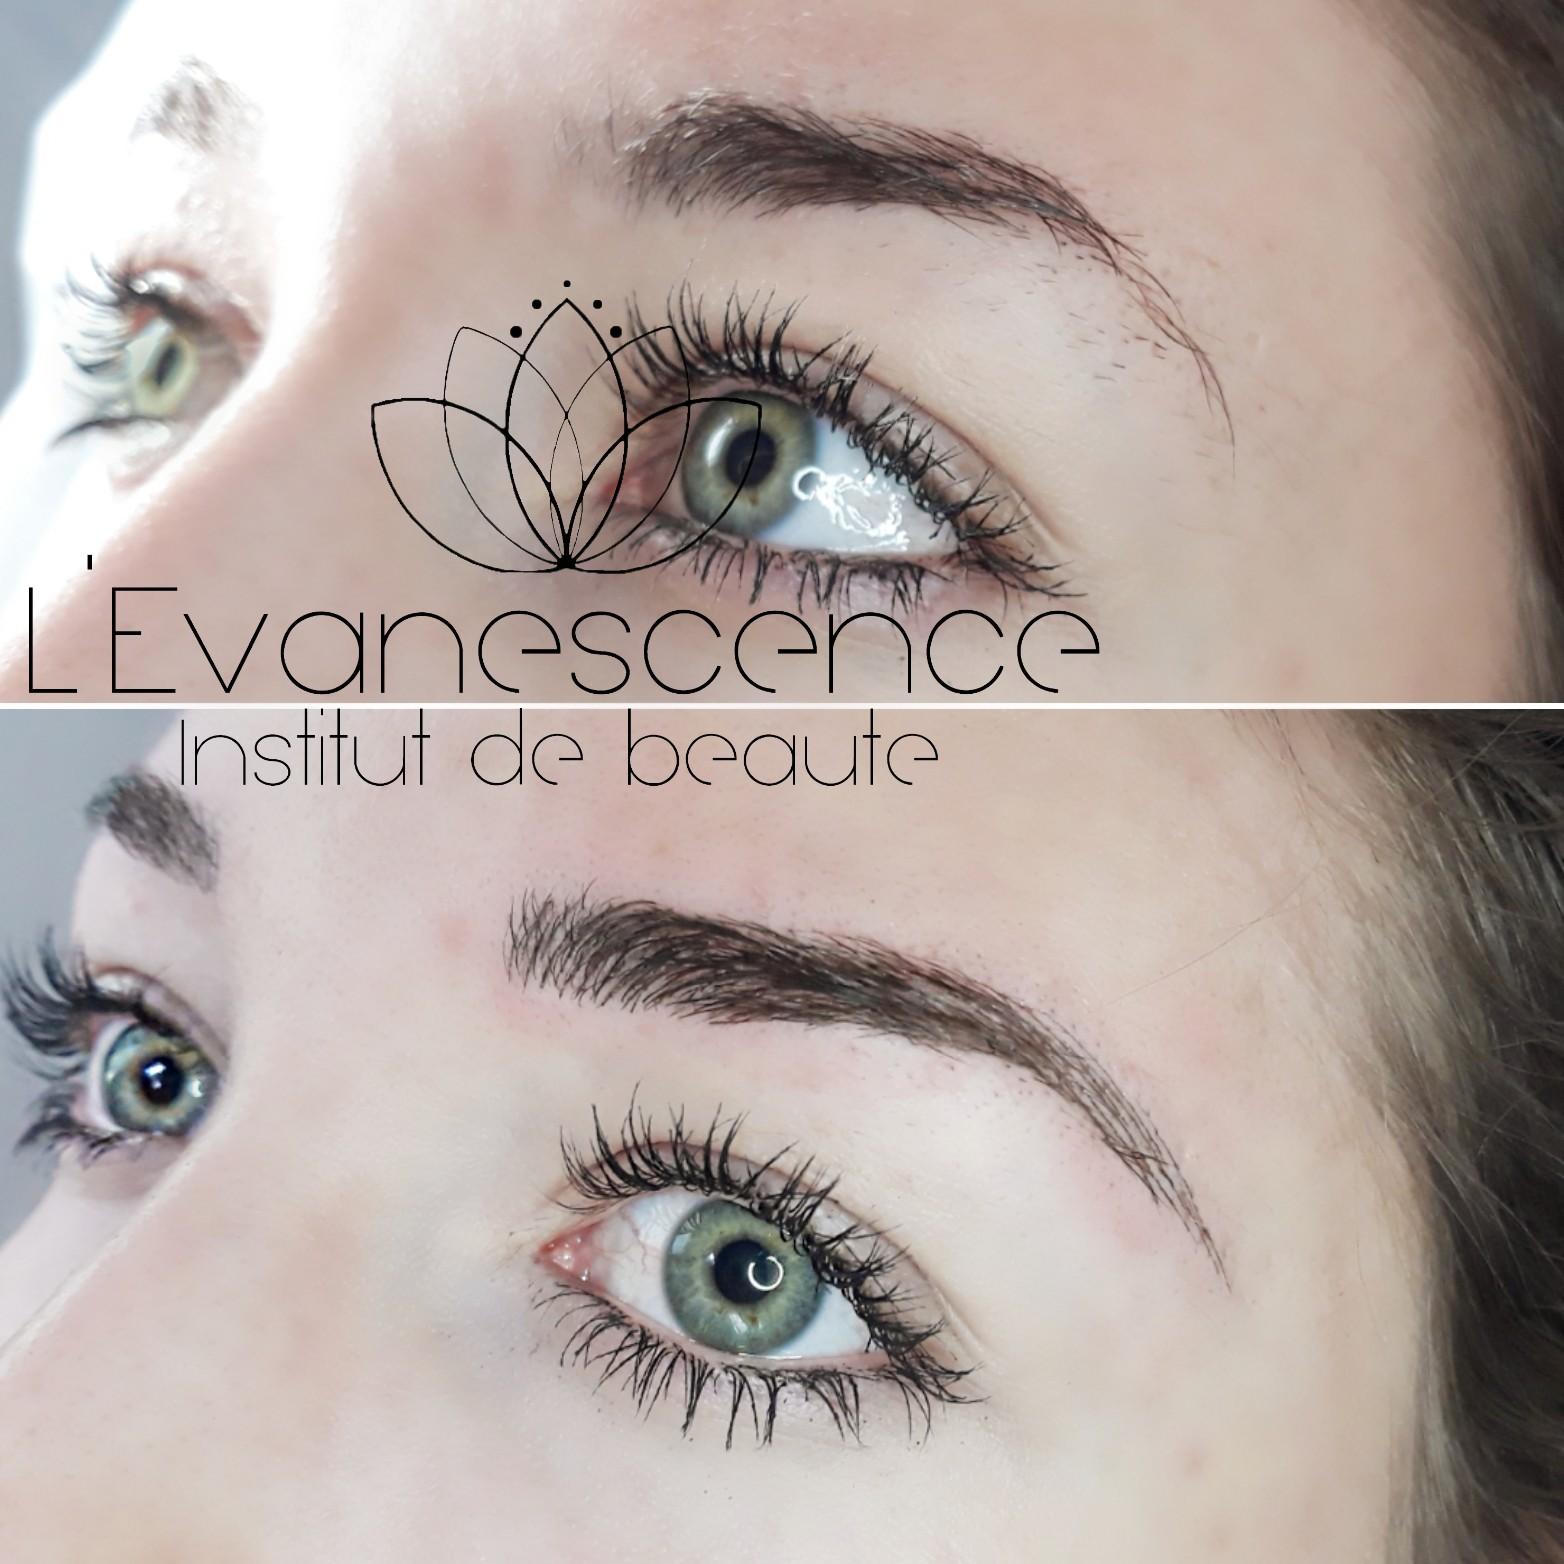 microblading L'Evanescence Valais